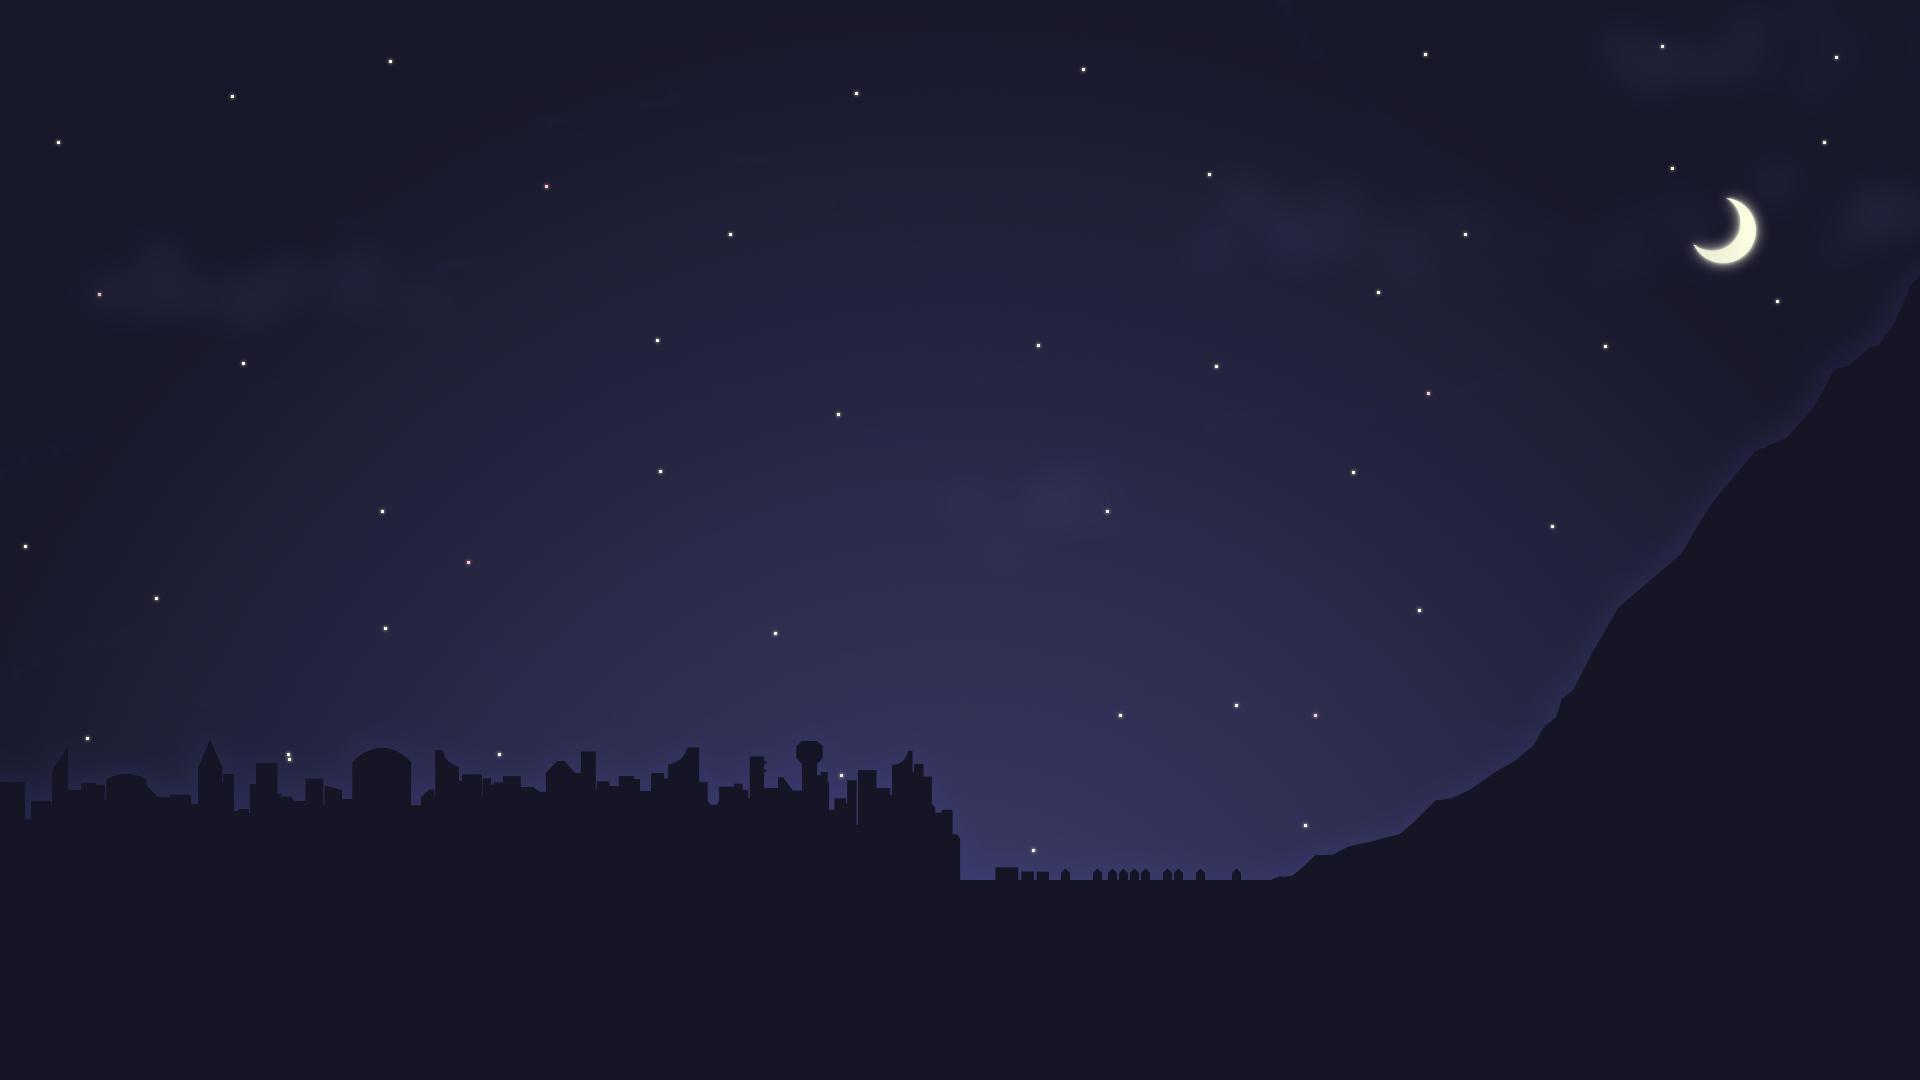 Night Sky Wallpaper by dji435 1920x1080